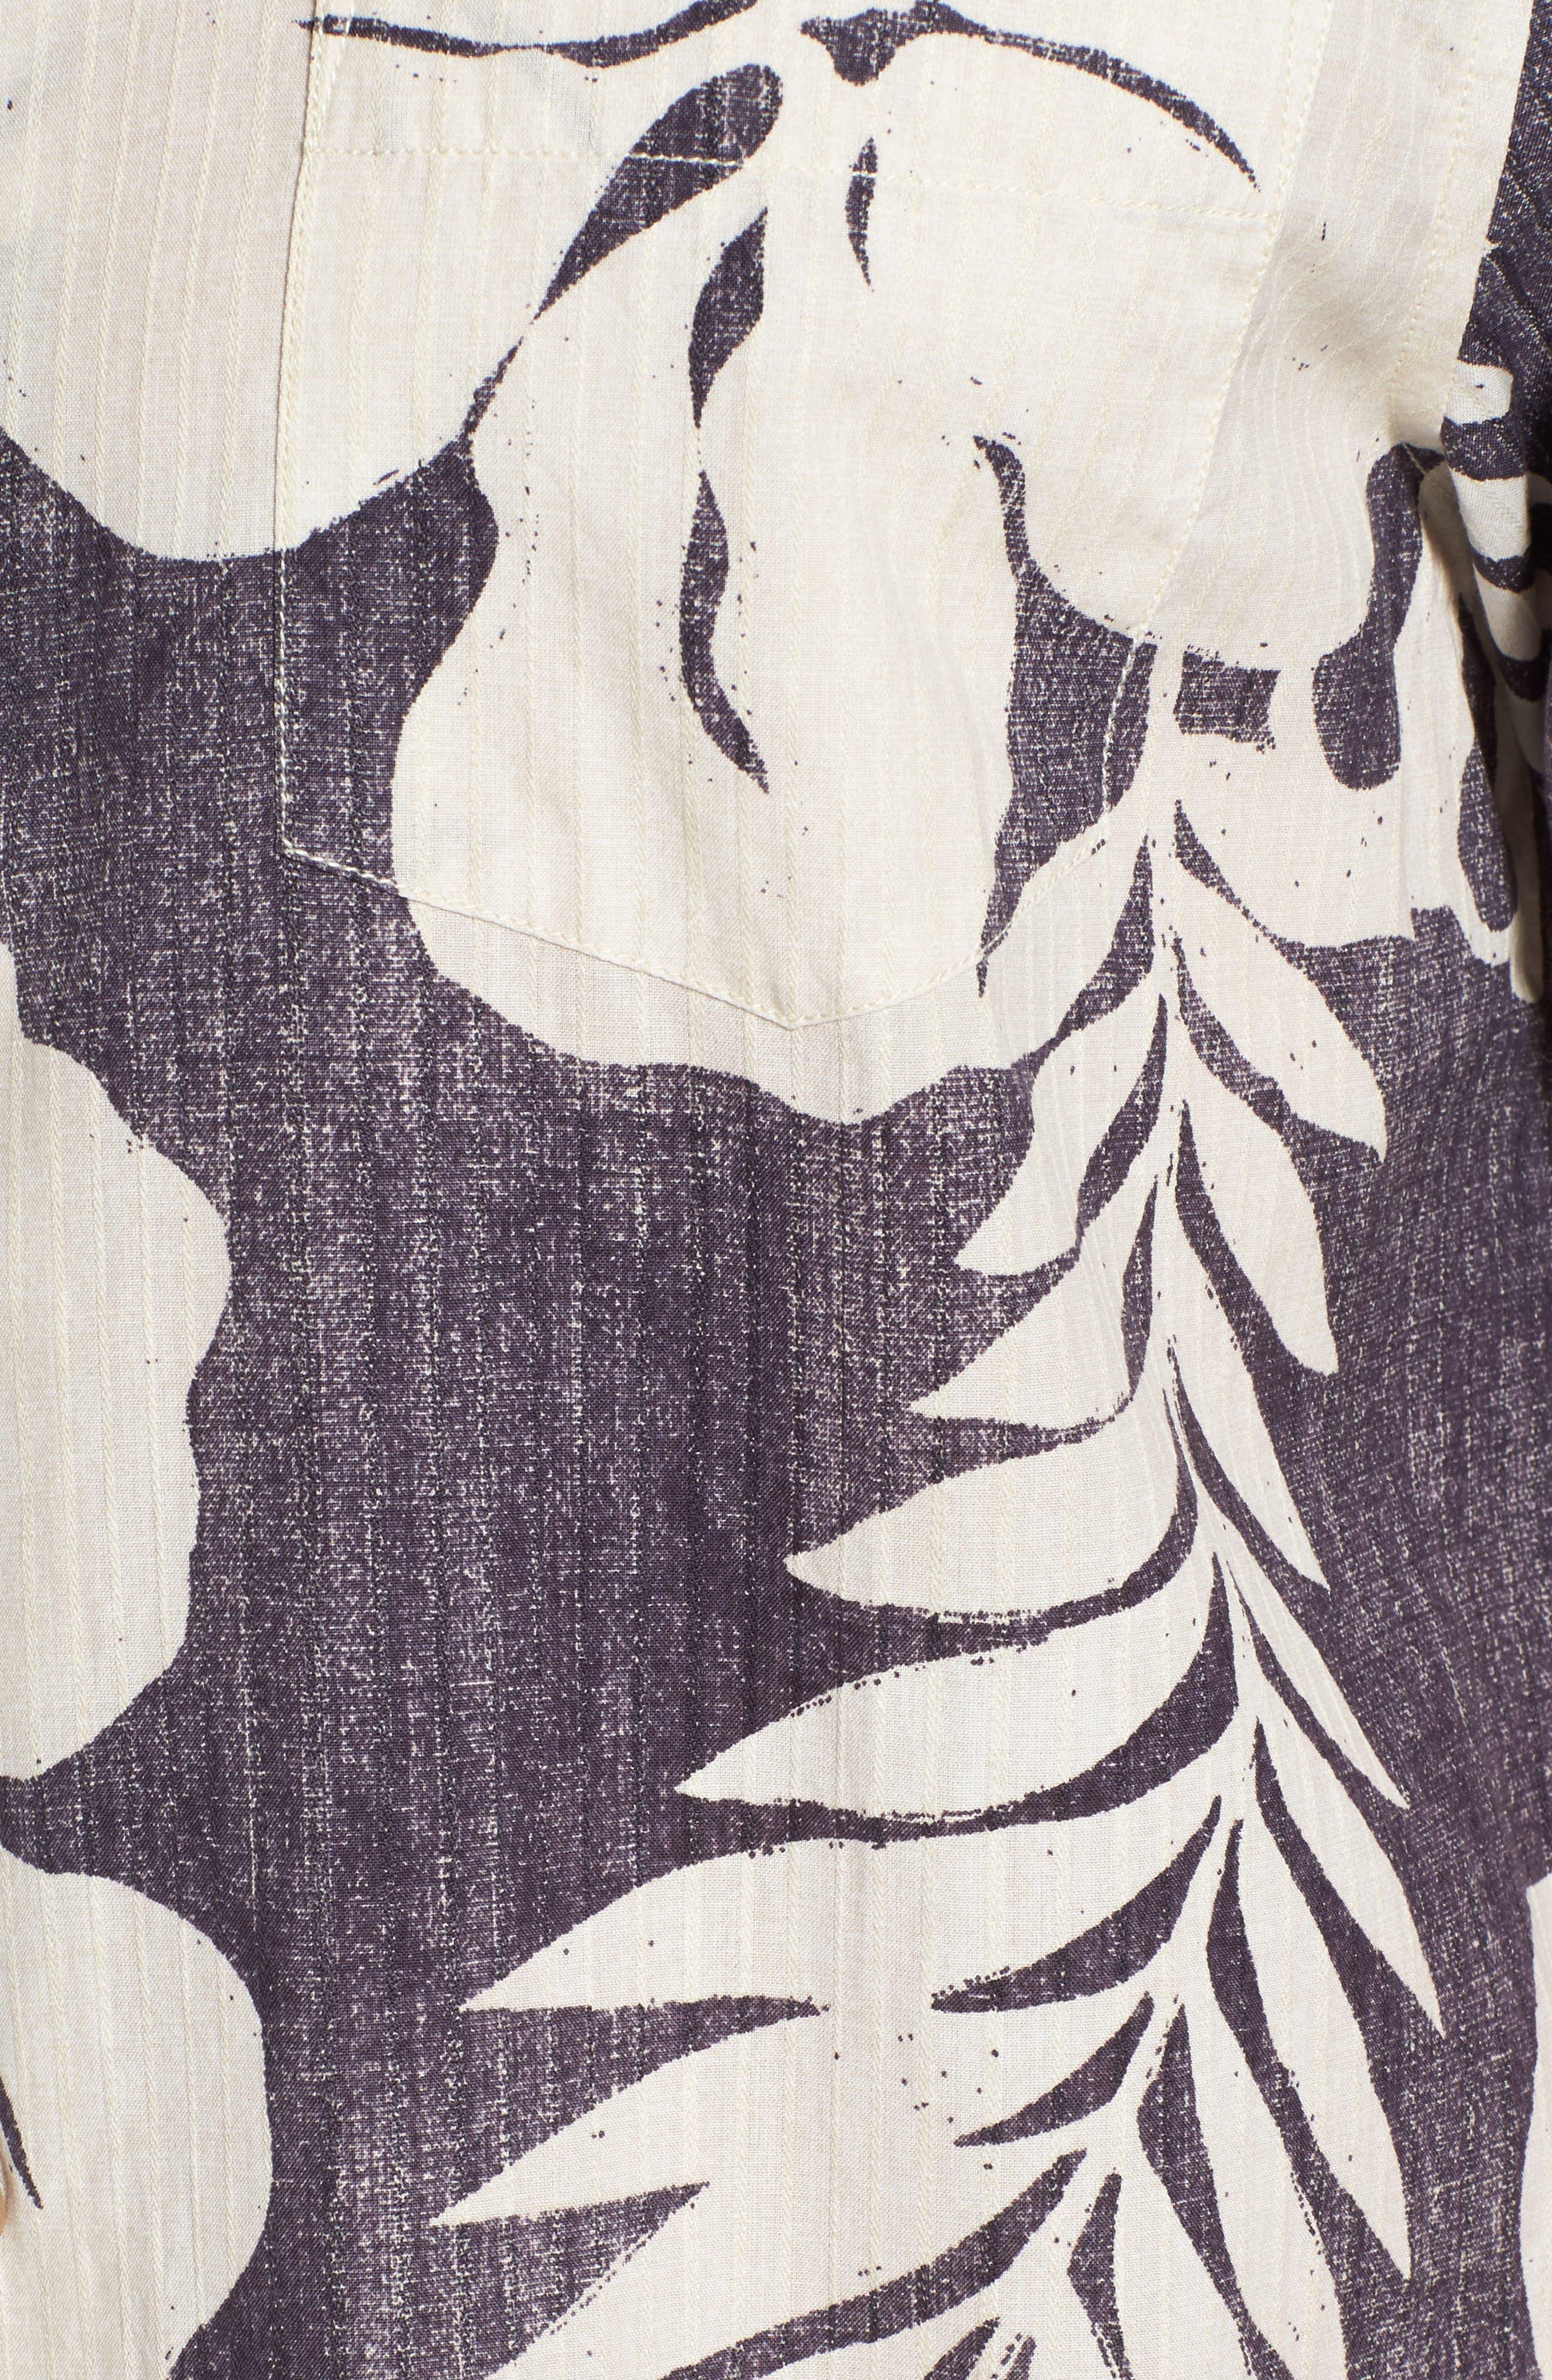 Hialeah Hibiscus Camp Shirt,                             Alternate thumbnail 5, color,                             Steel Wool